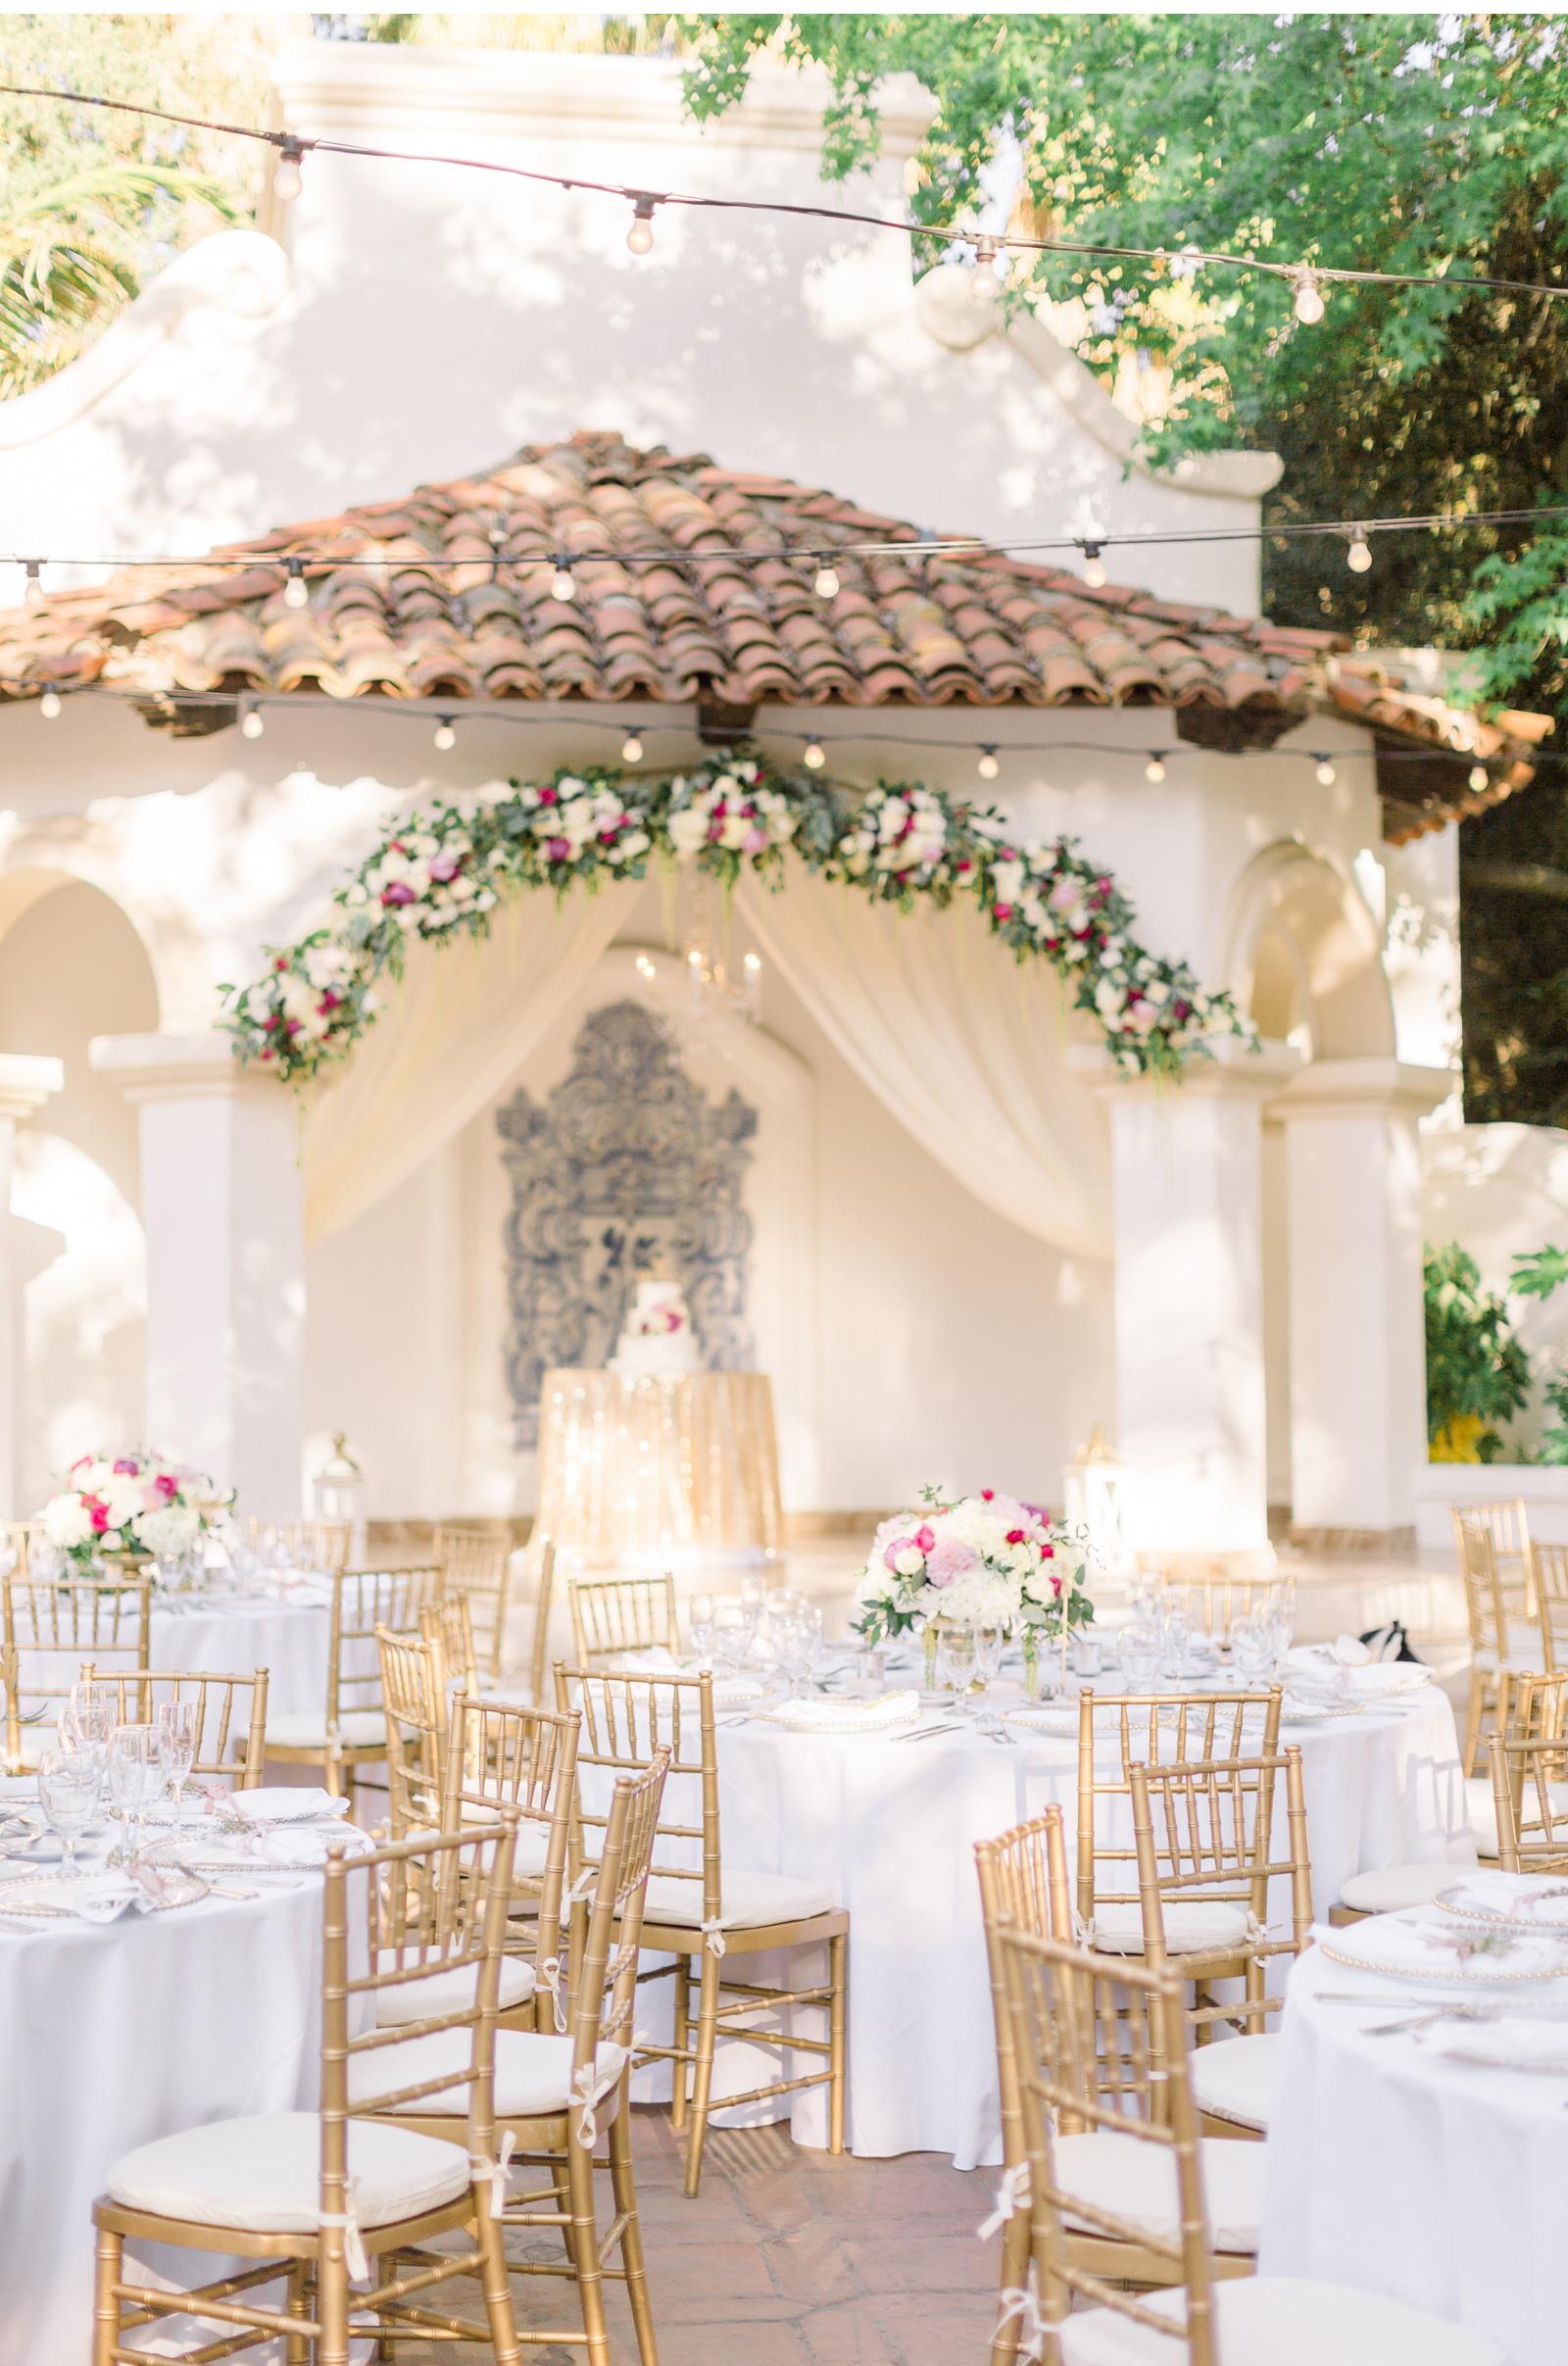 Rancho-Las-Lomas-Style-Me-Pretty-Wedding-Natalie-Schutt-Photography_12.jpg